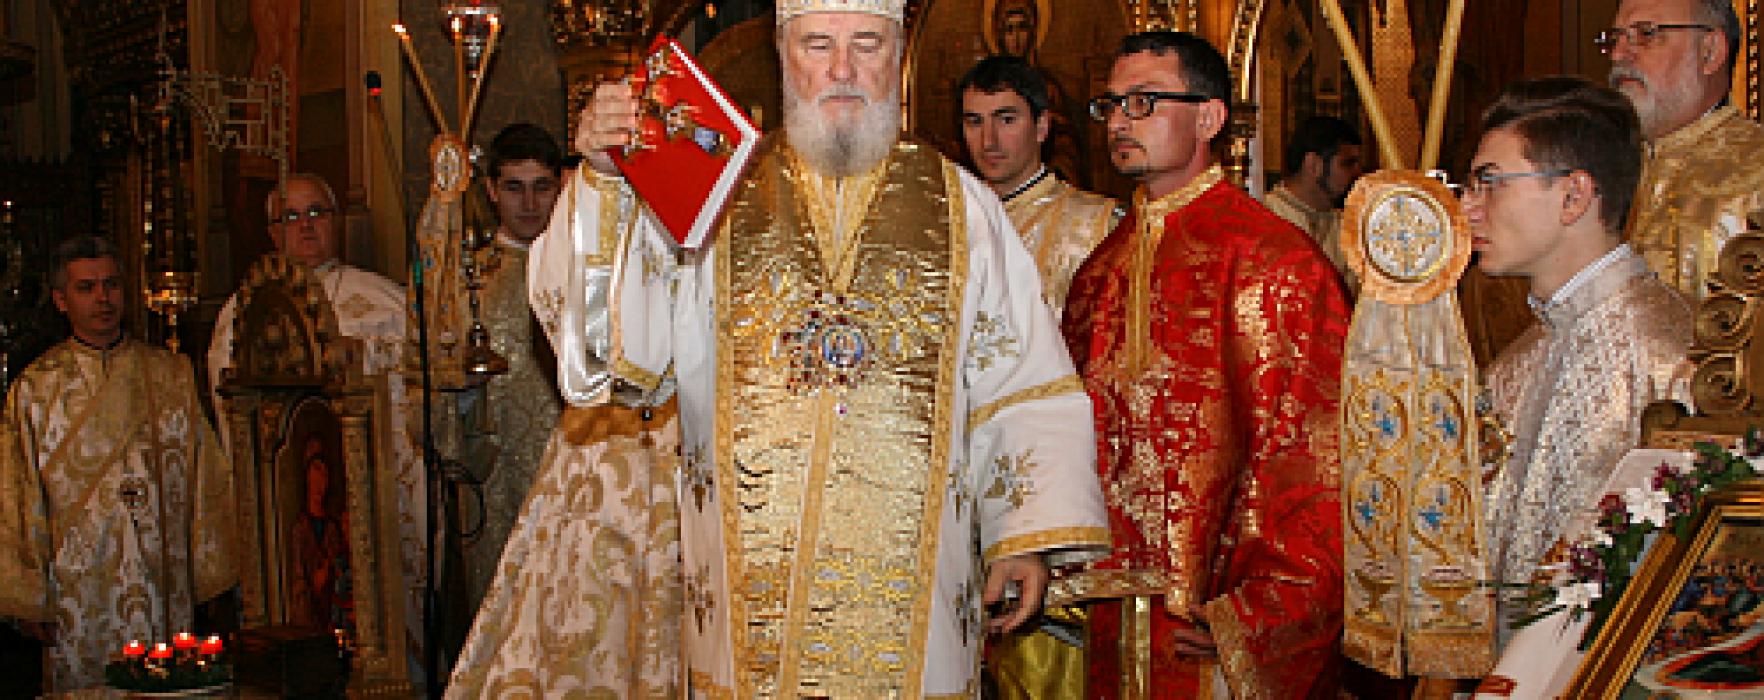 Arhiepiscopul şi Mitropolitul Nifon, la 14 ani de arhipăstorire la Târgovişte